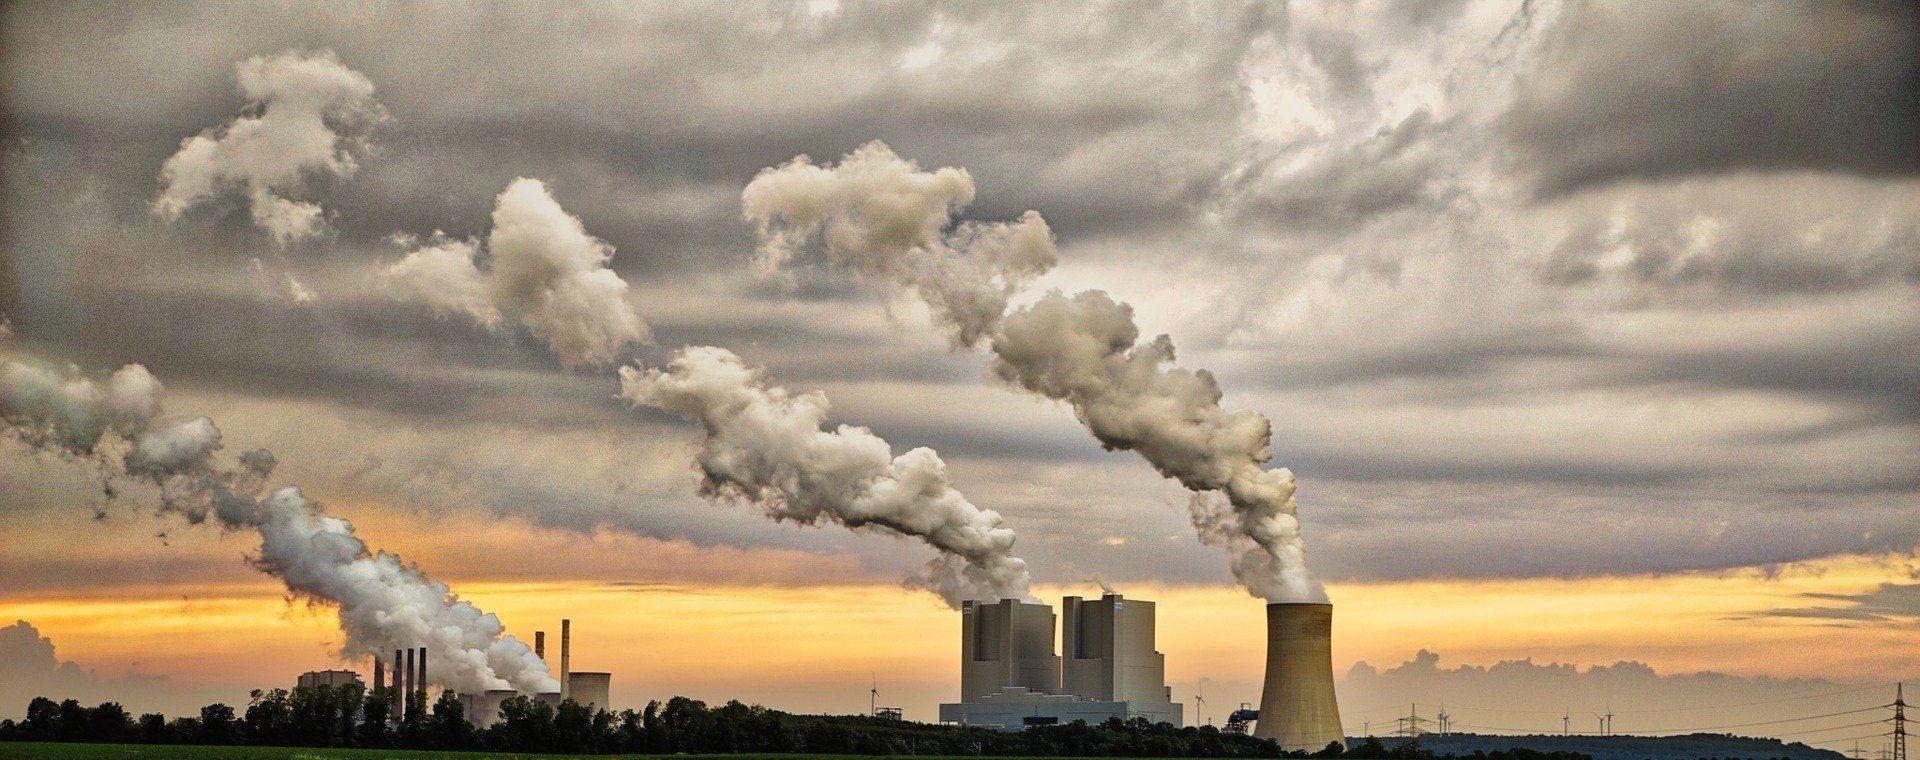 AleaSoft - Coal power plant